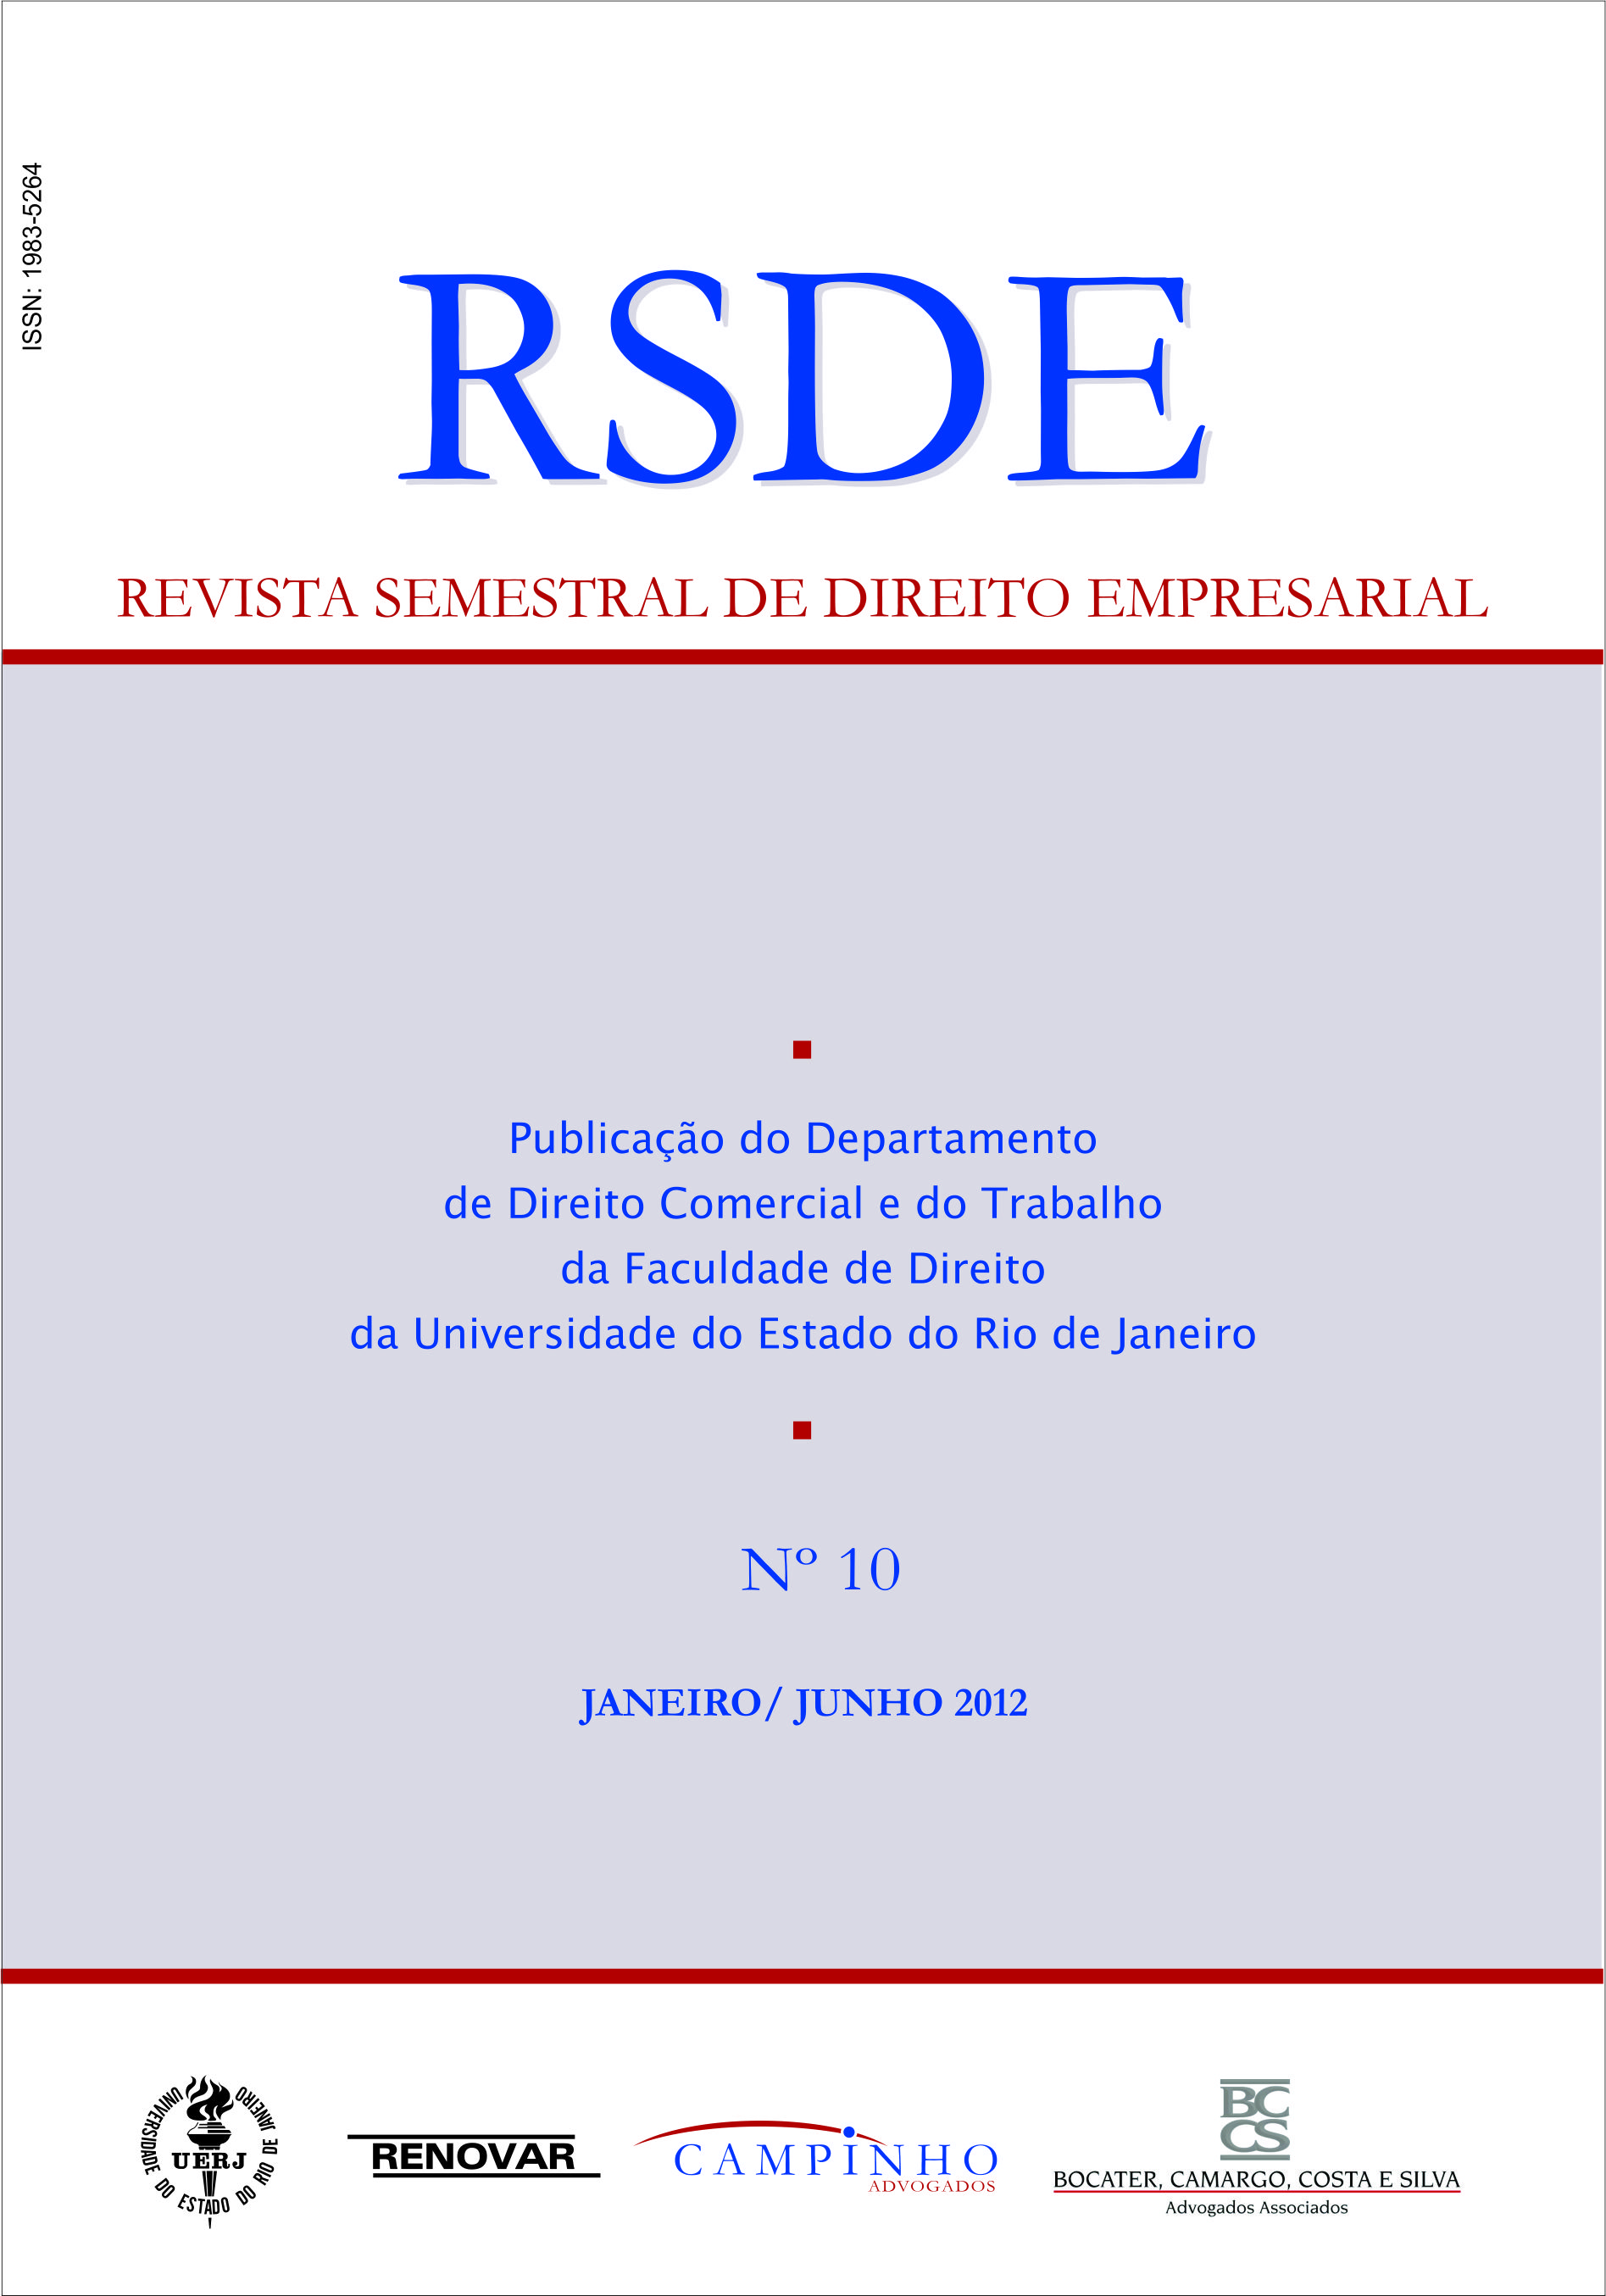 Rsde_-_10__1_